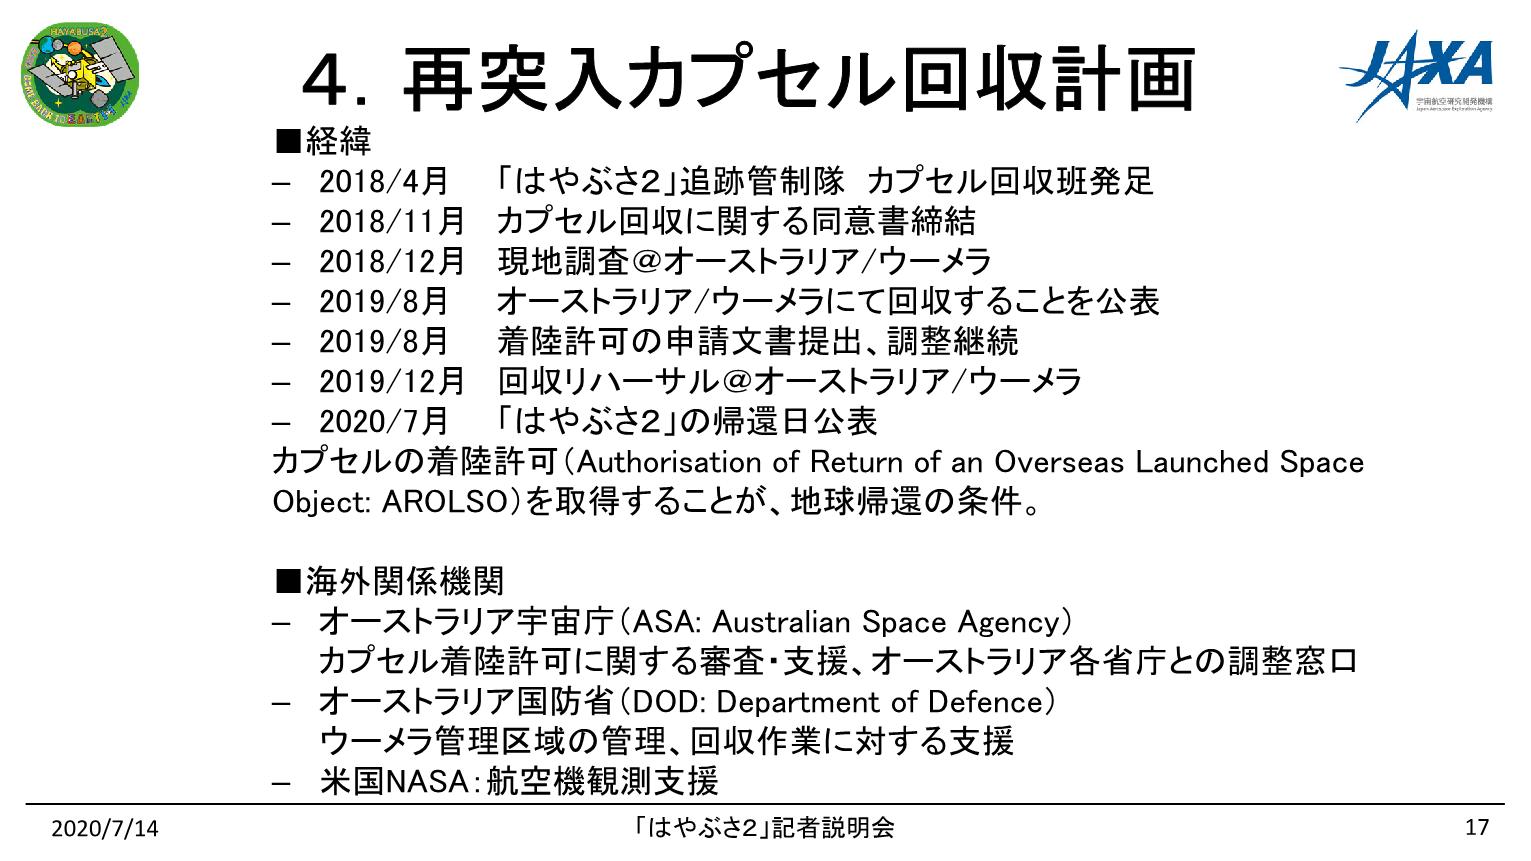 f:id:Imamura:20200714230343p:plain